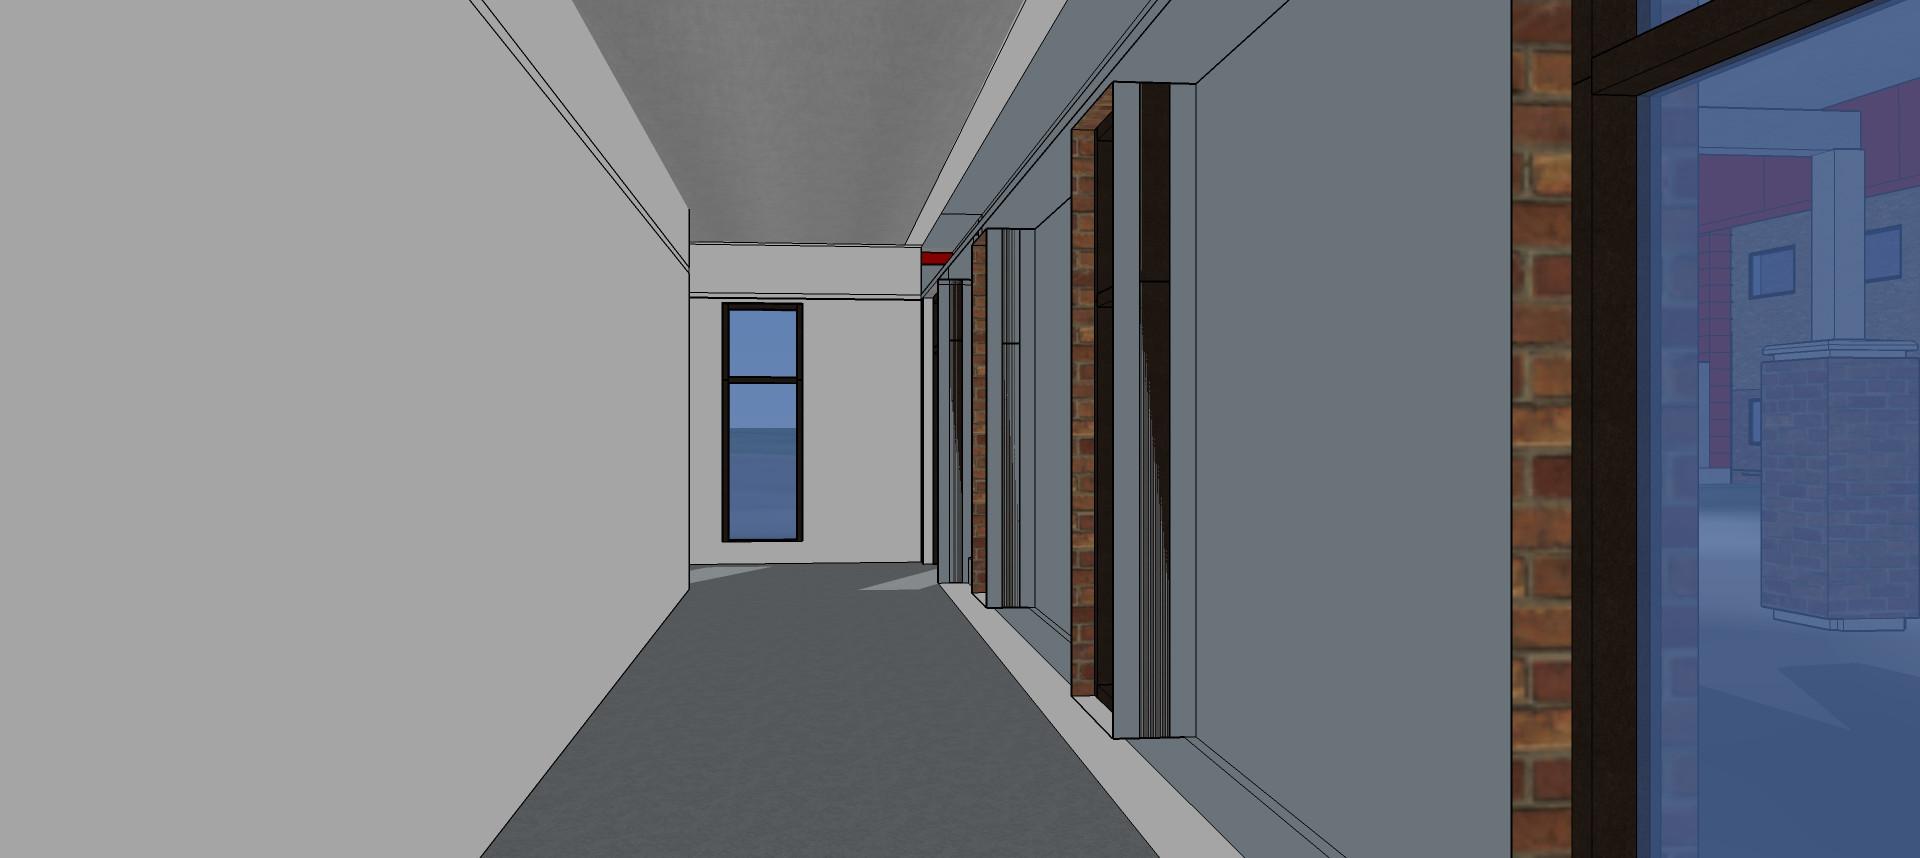 Hallway in Athletic Locker Rooms